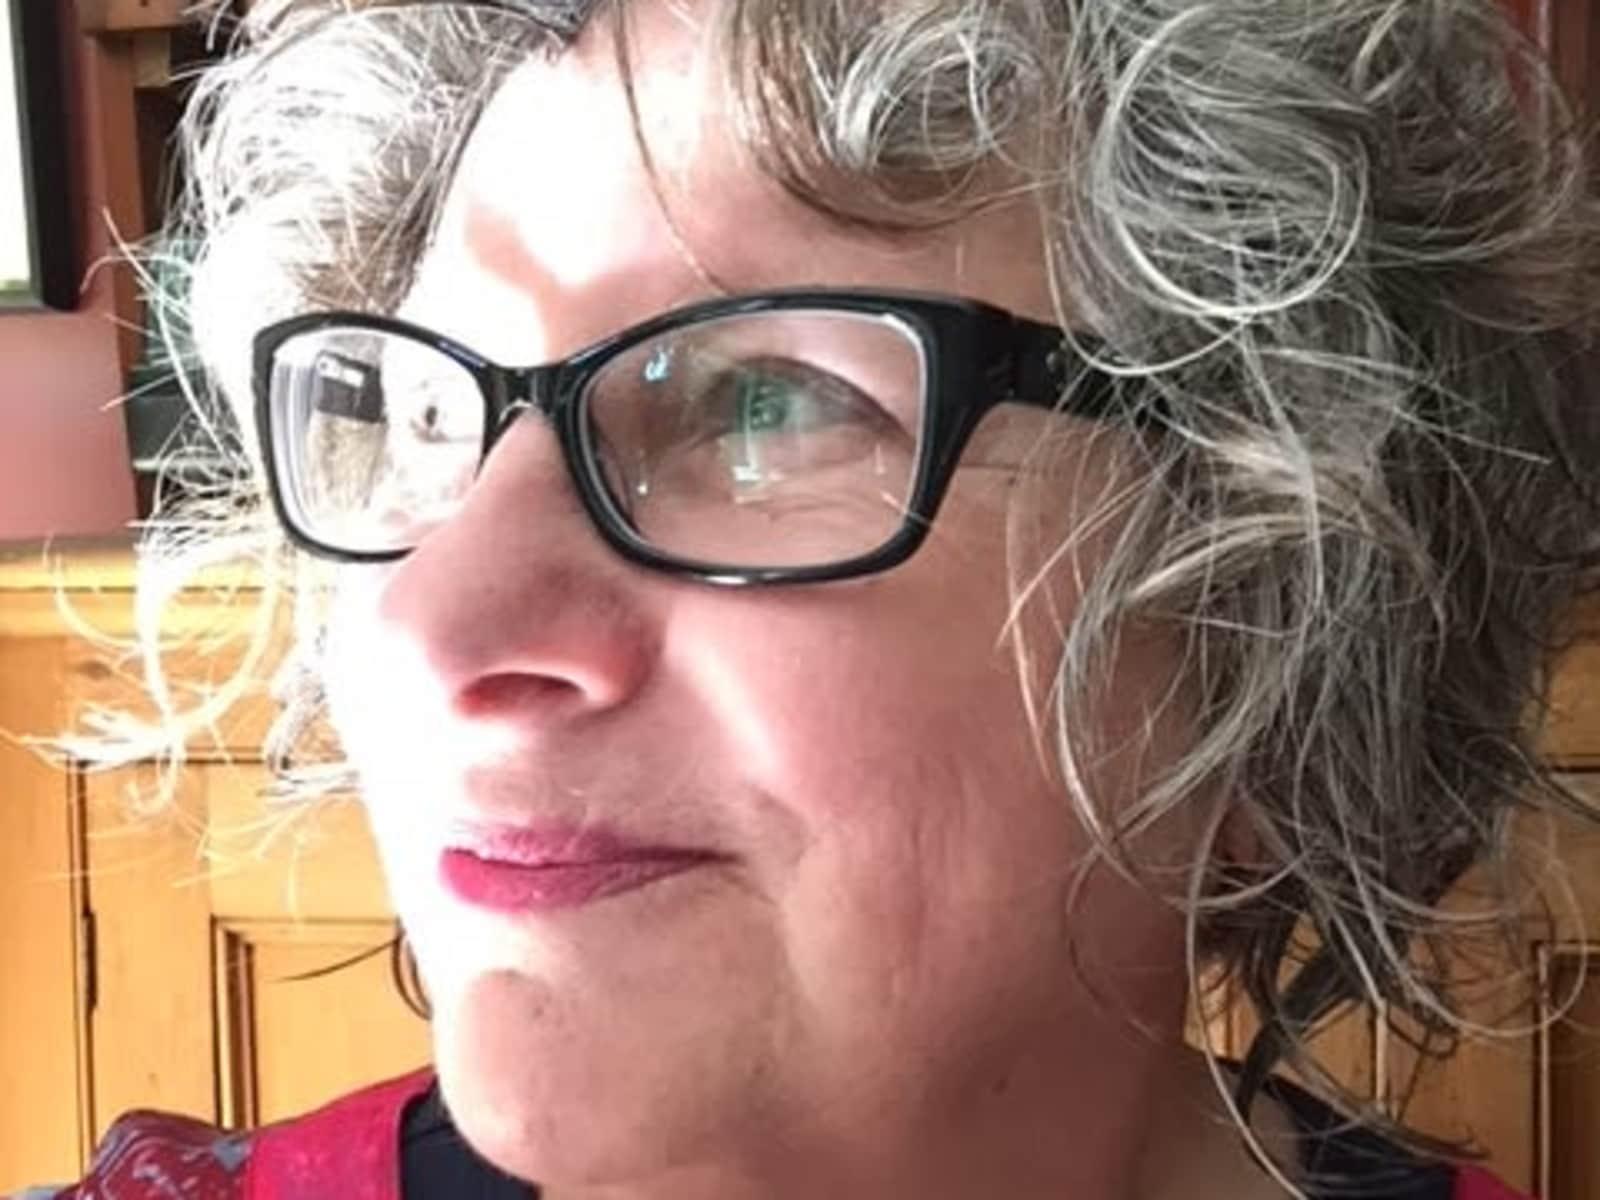 Brenda from Kitchener, Ontario, Canada